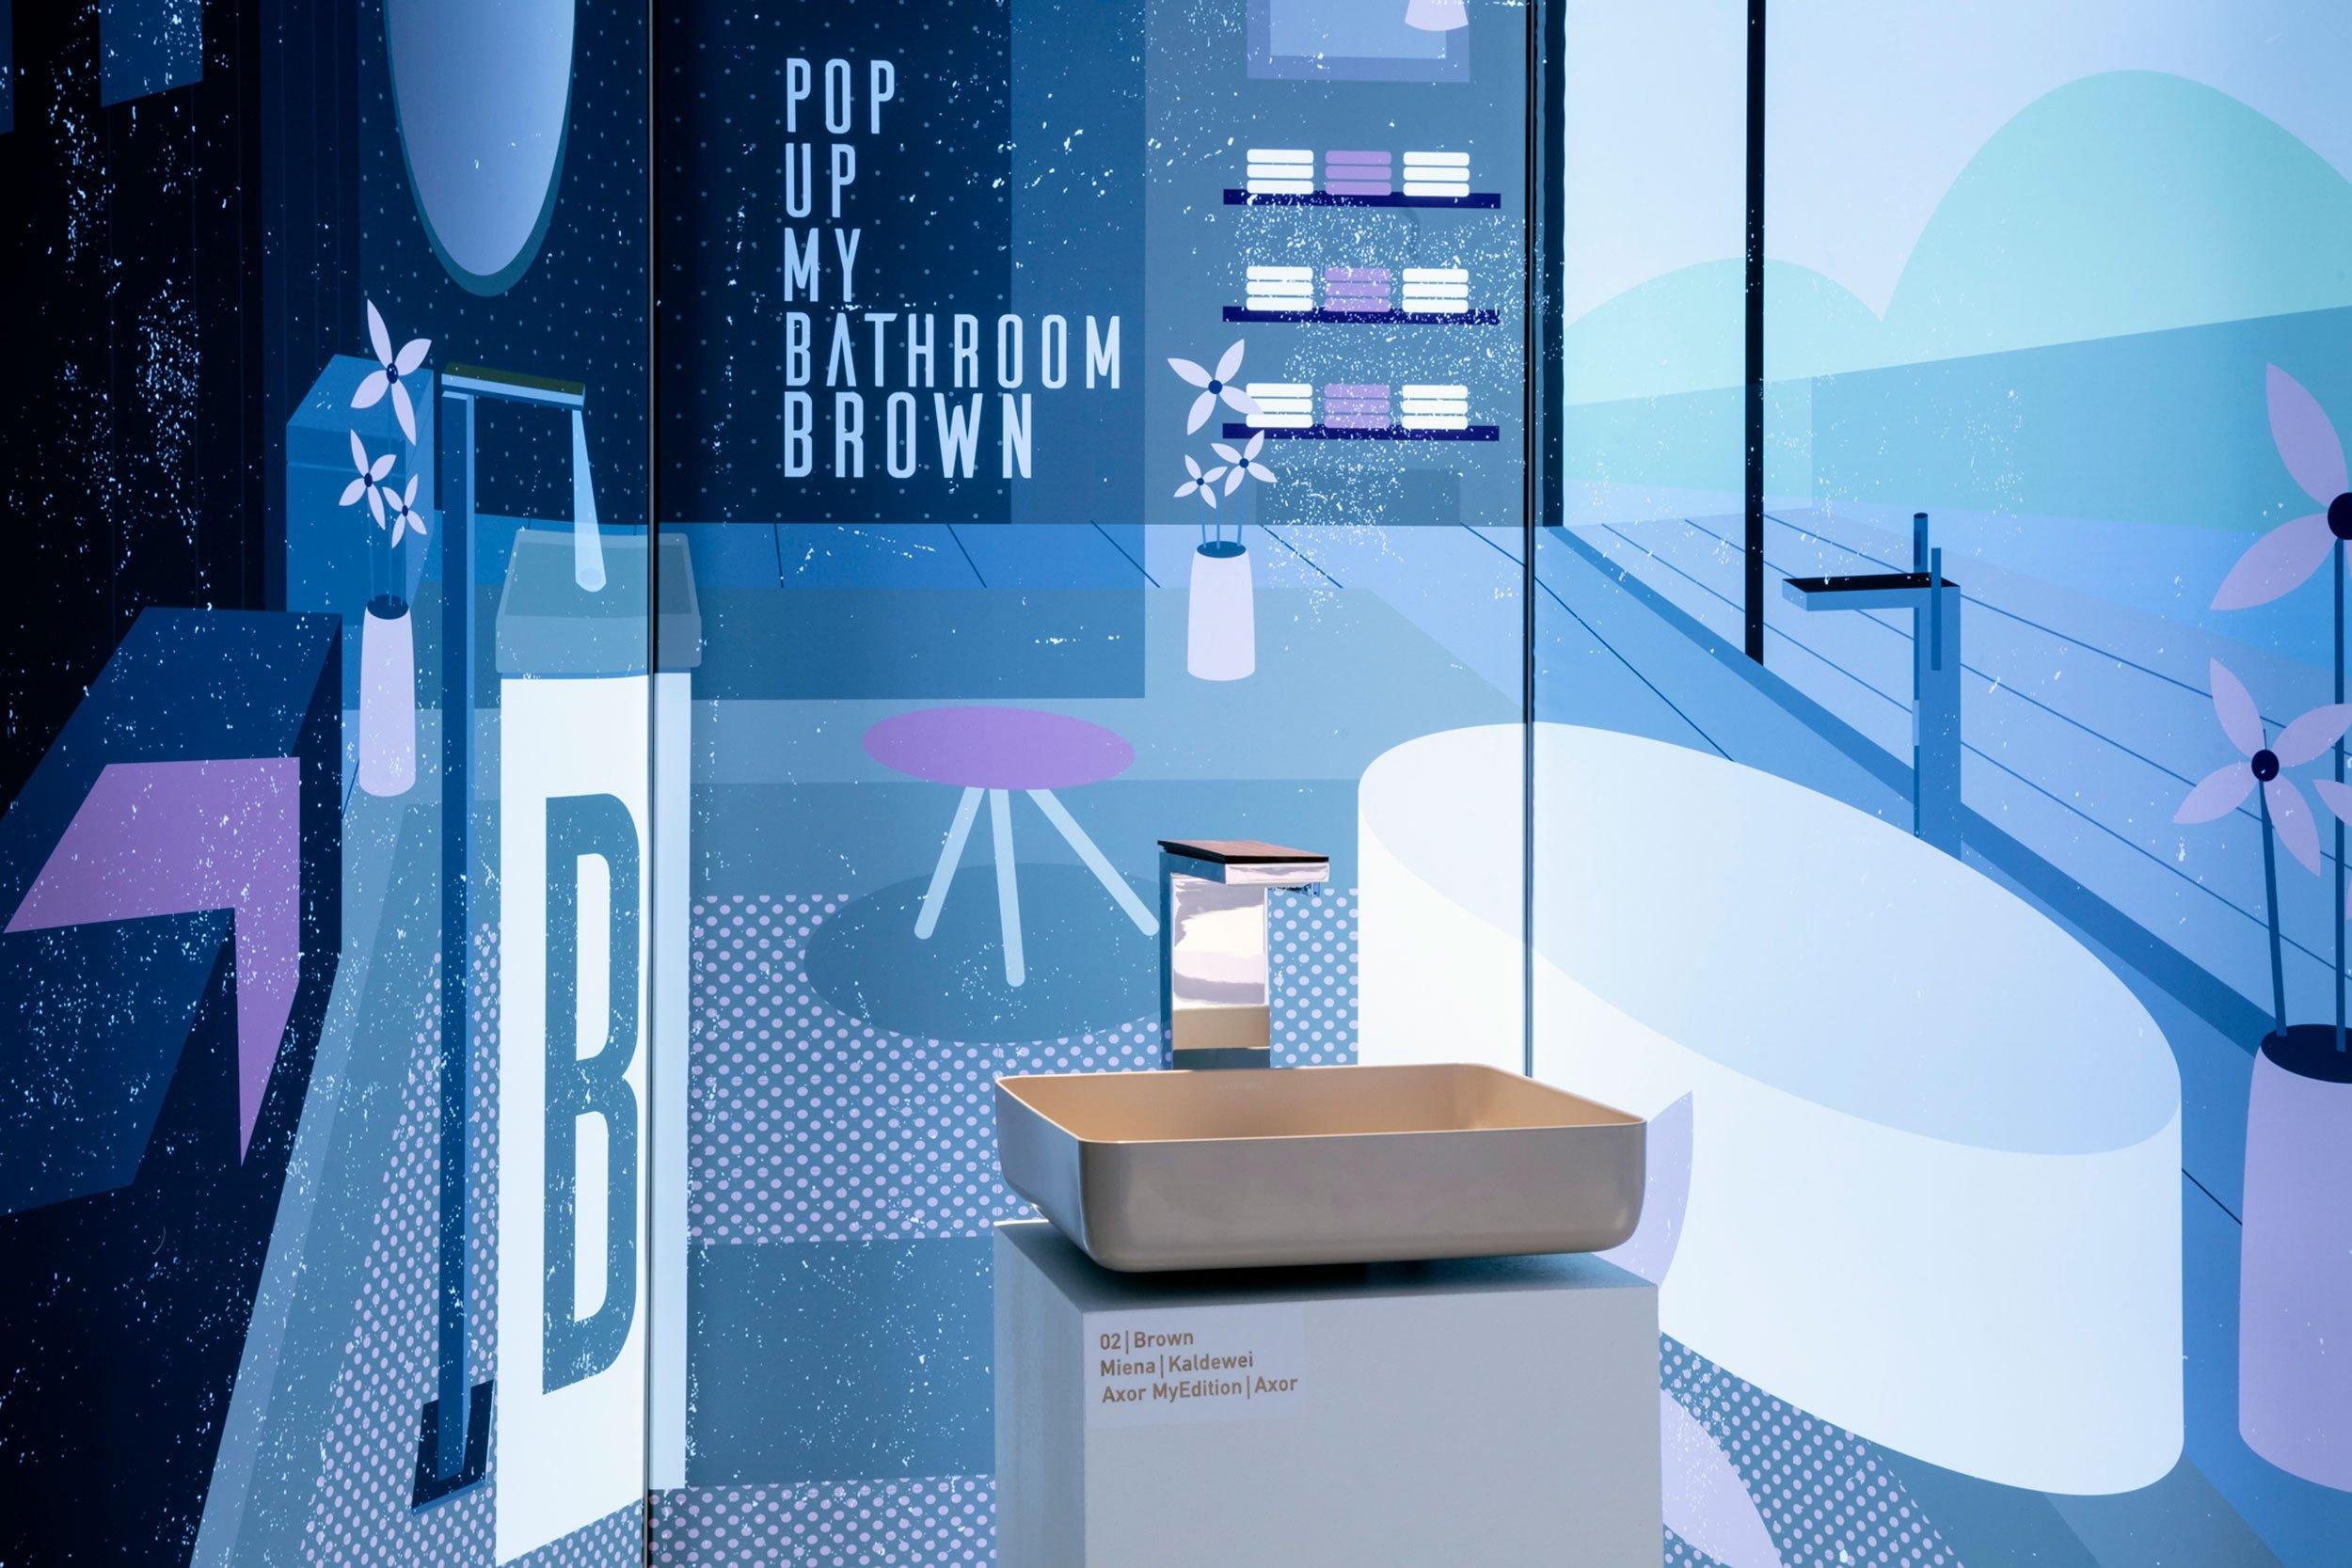 https://farconsulting.de/wp-content/uploads/2020/03/02_Pop-up-my-Bathroom_Ausstellung_ISH-2019.jpg